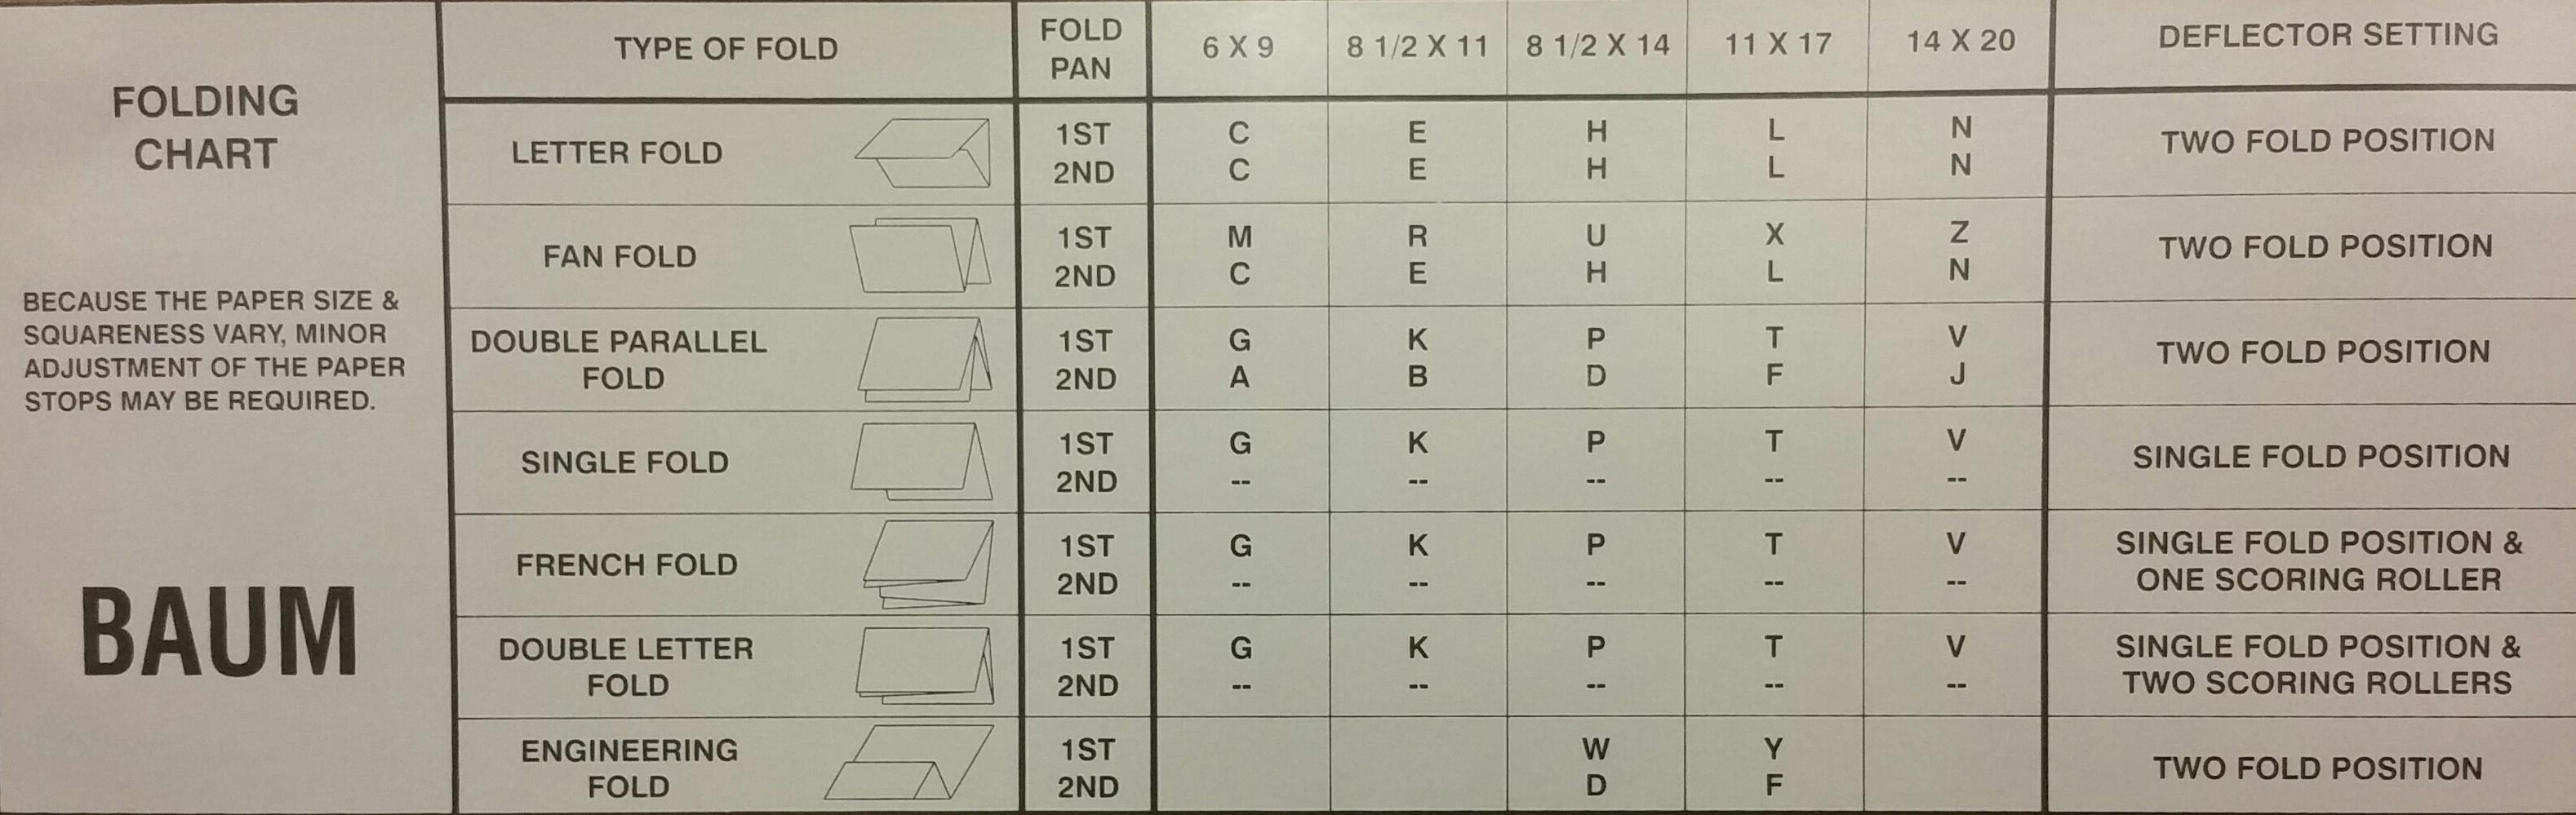 714-fold-chart1.jpg